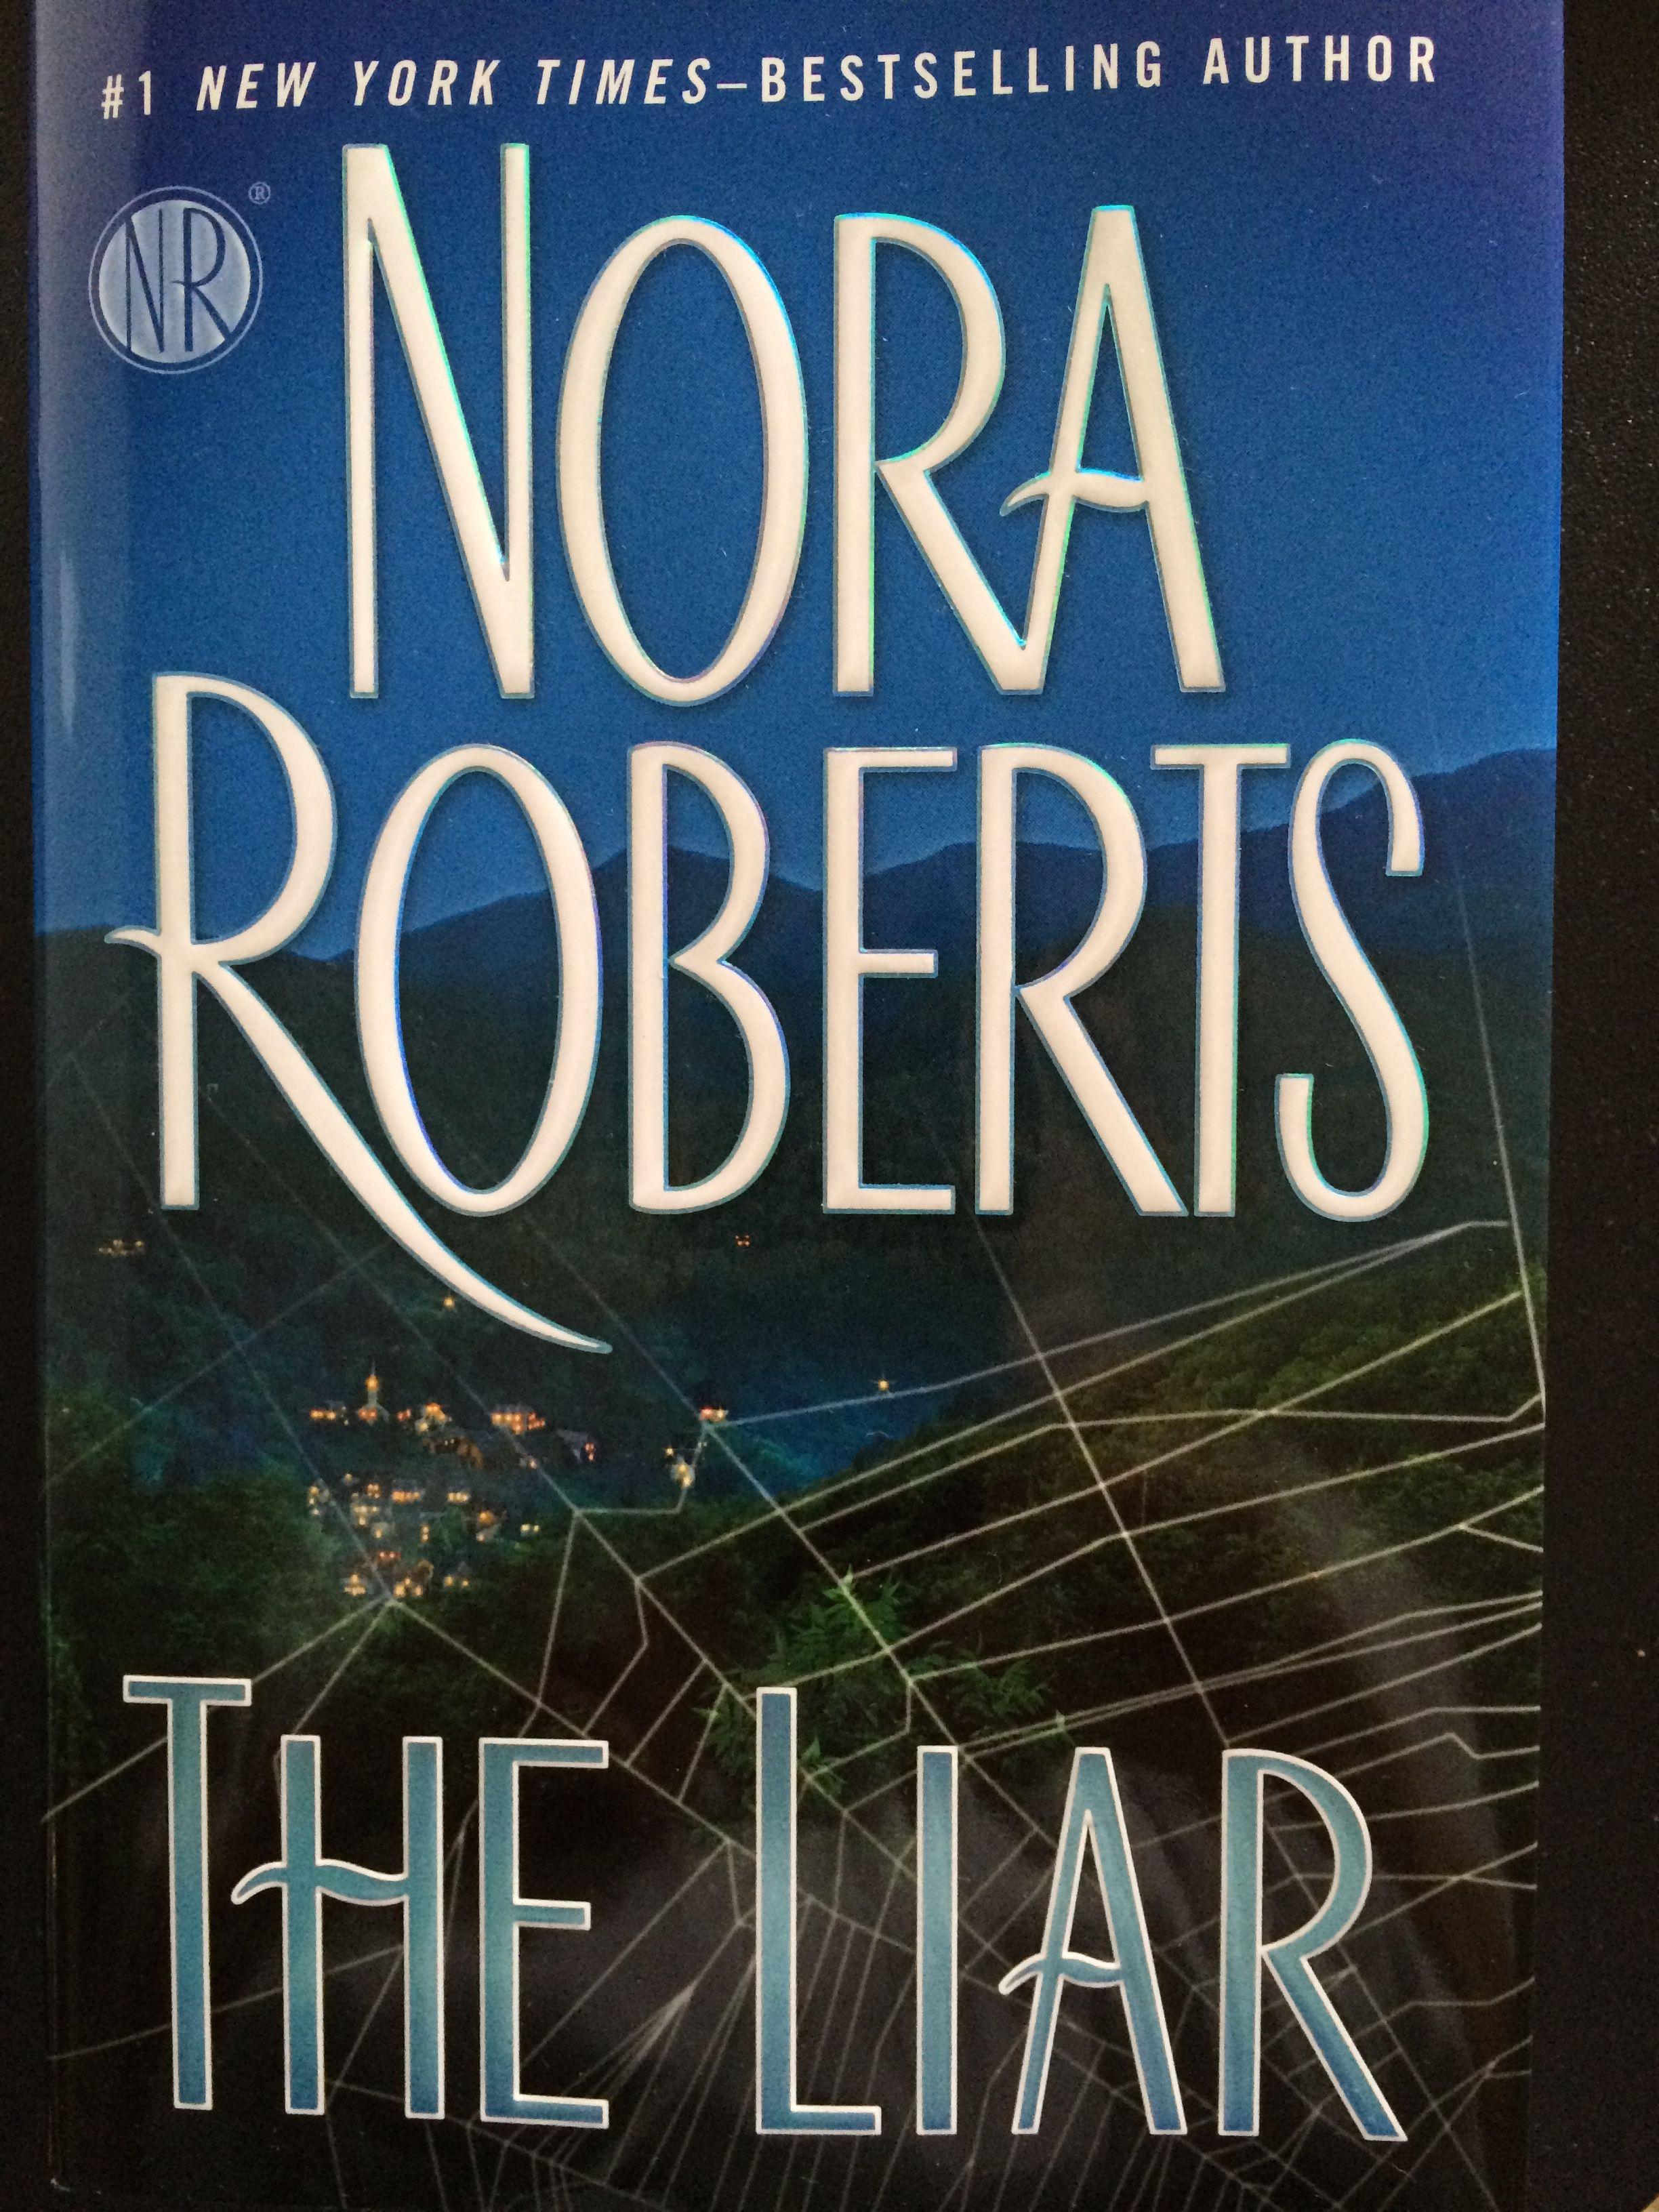 Melissa blanchard book corner nora roberts books nora